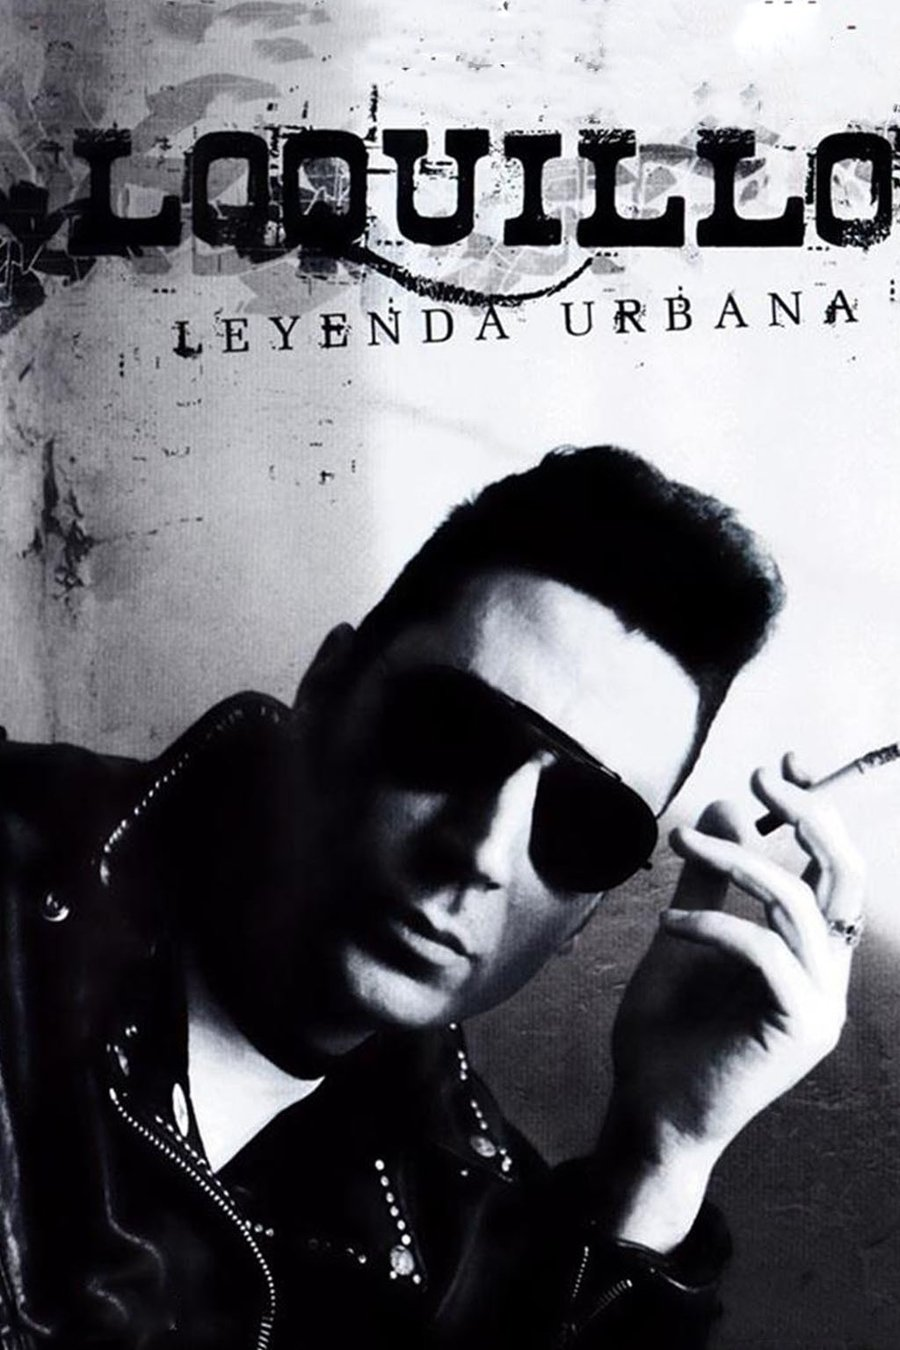 Loquillo leyenda urbana